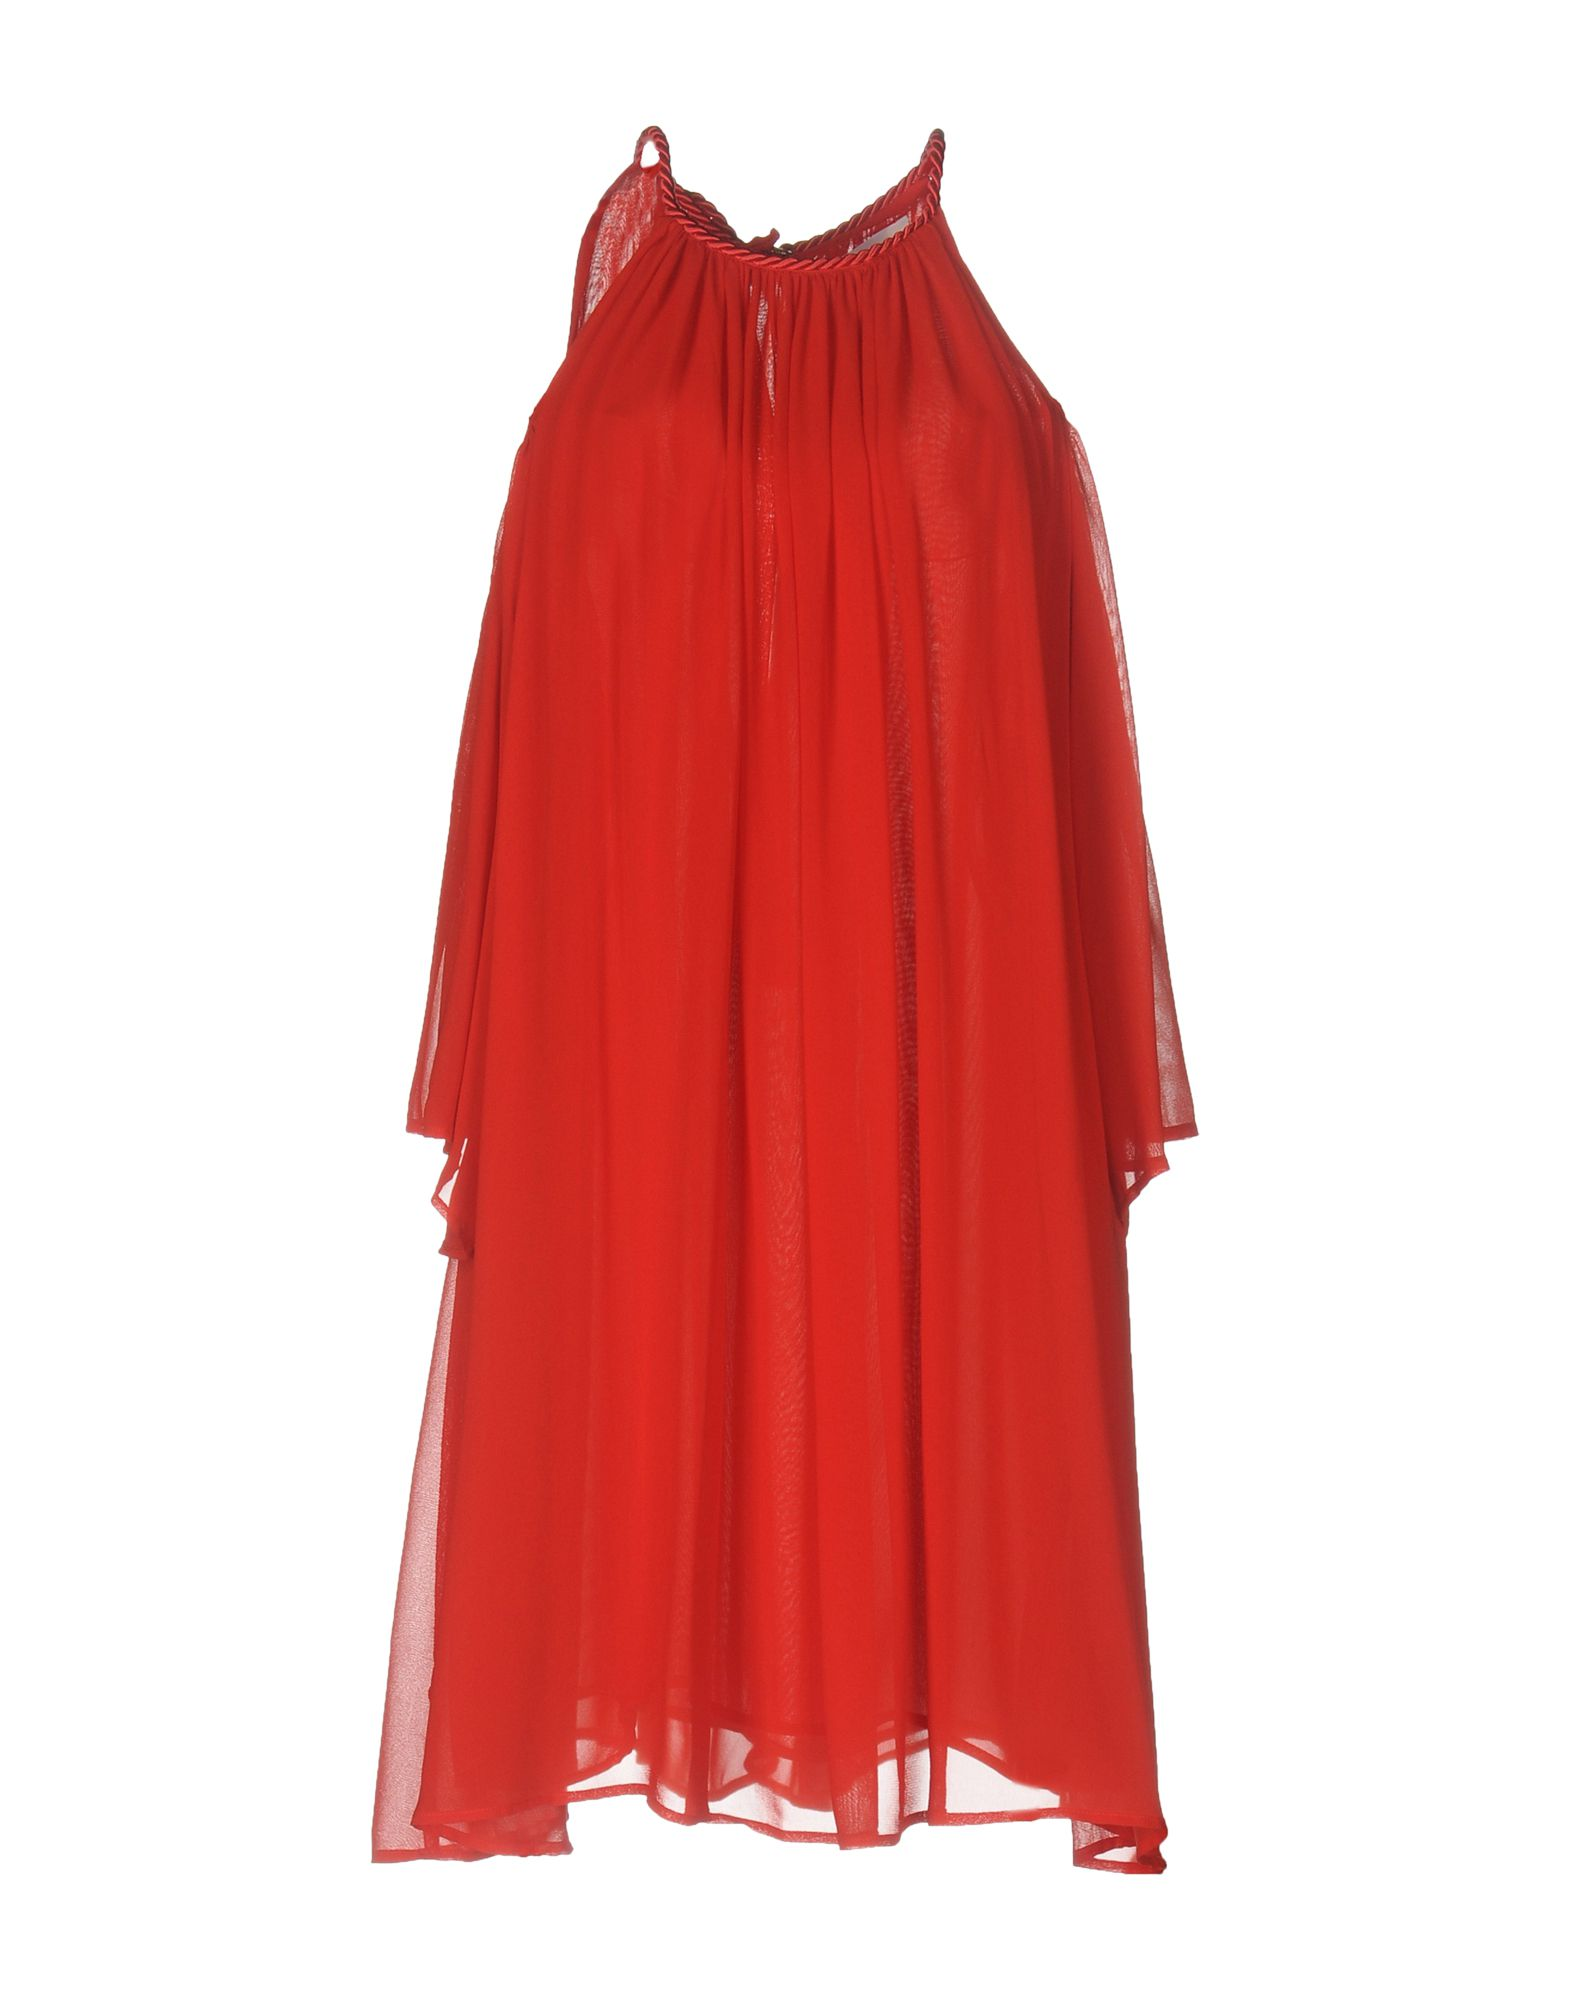 JUCCA Damen Kurzes Kleid Farbe Rot Größe 4 jetztbilligerkaufen